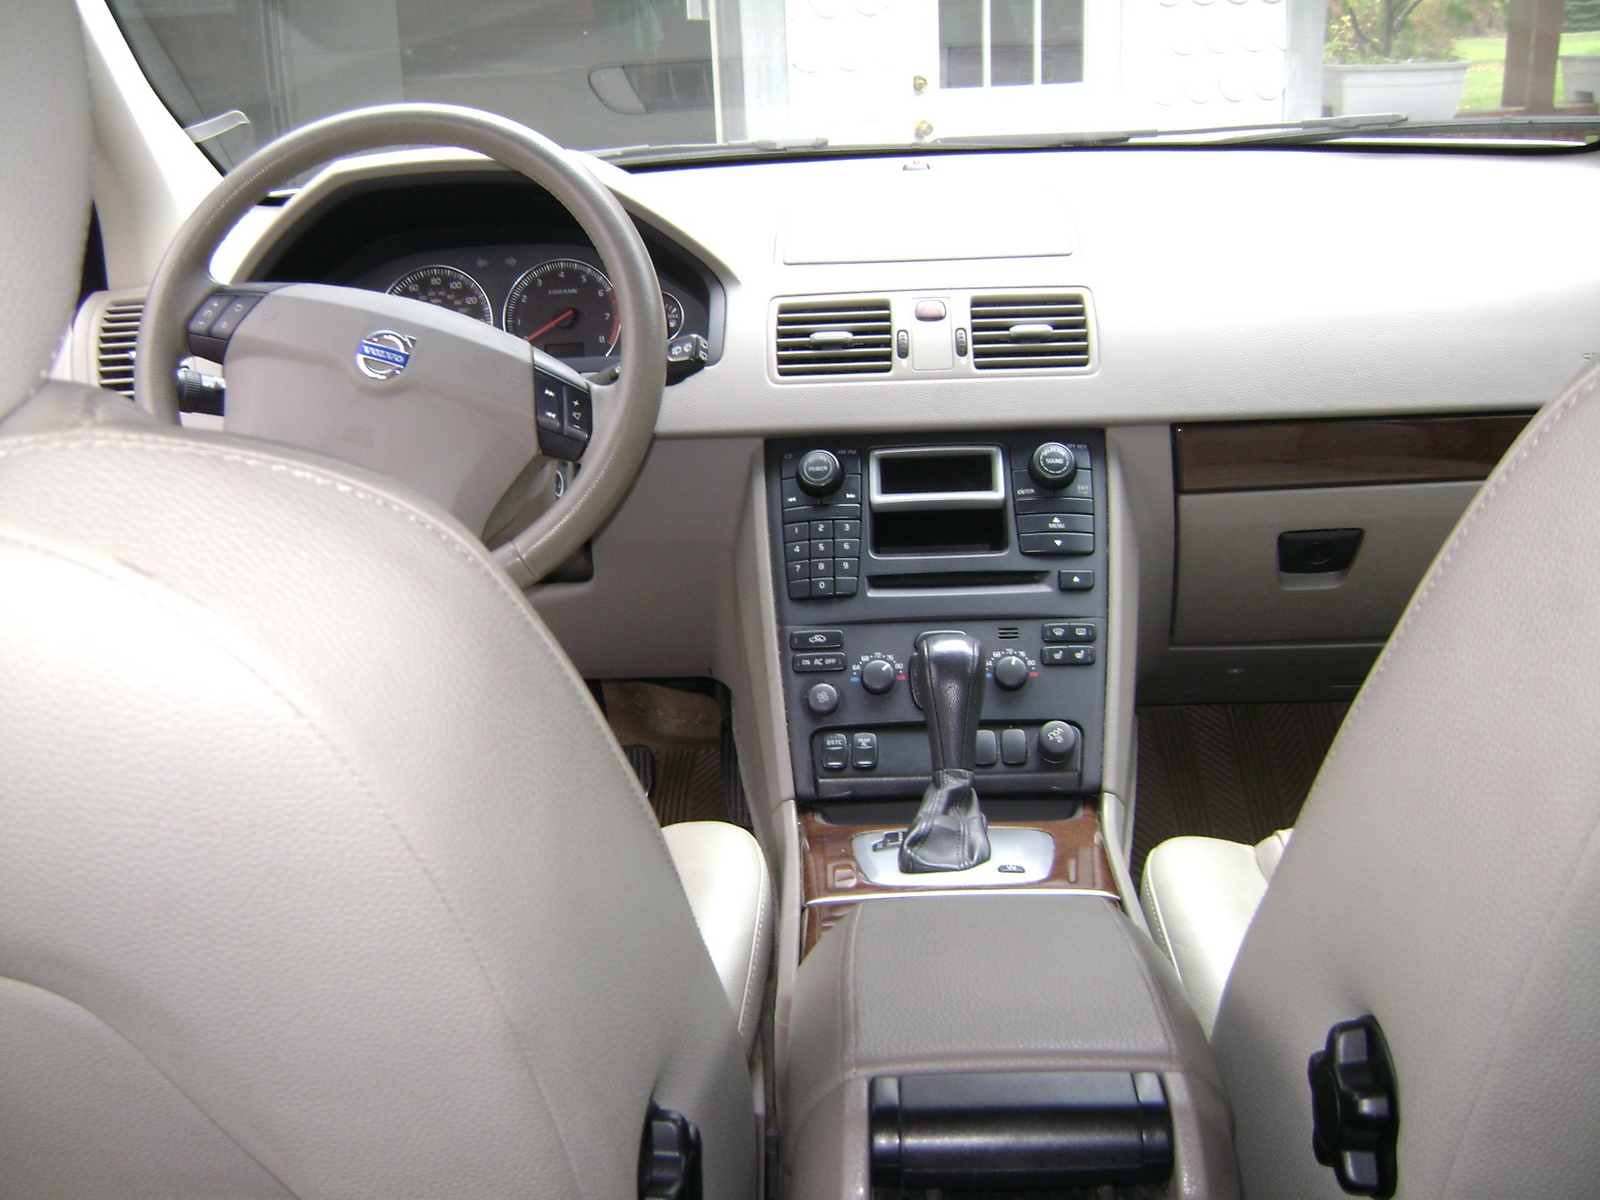 2005 Volvo XC90 Interior